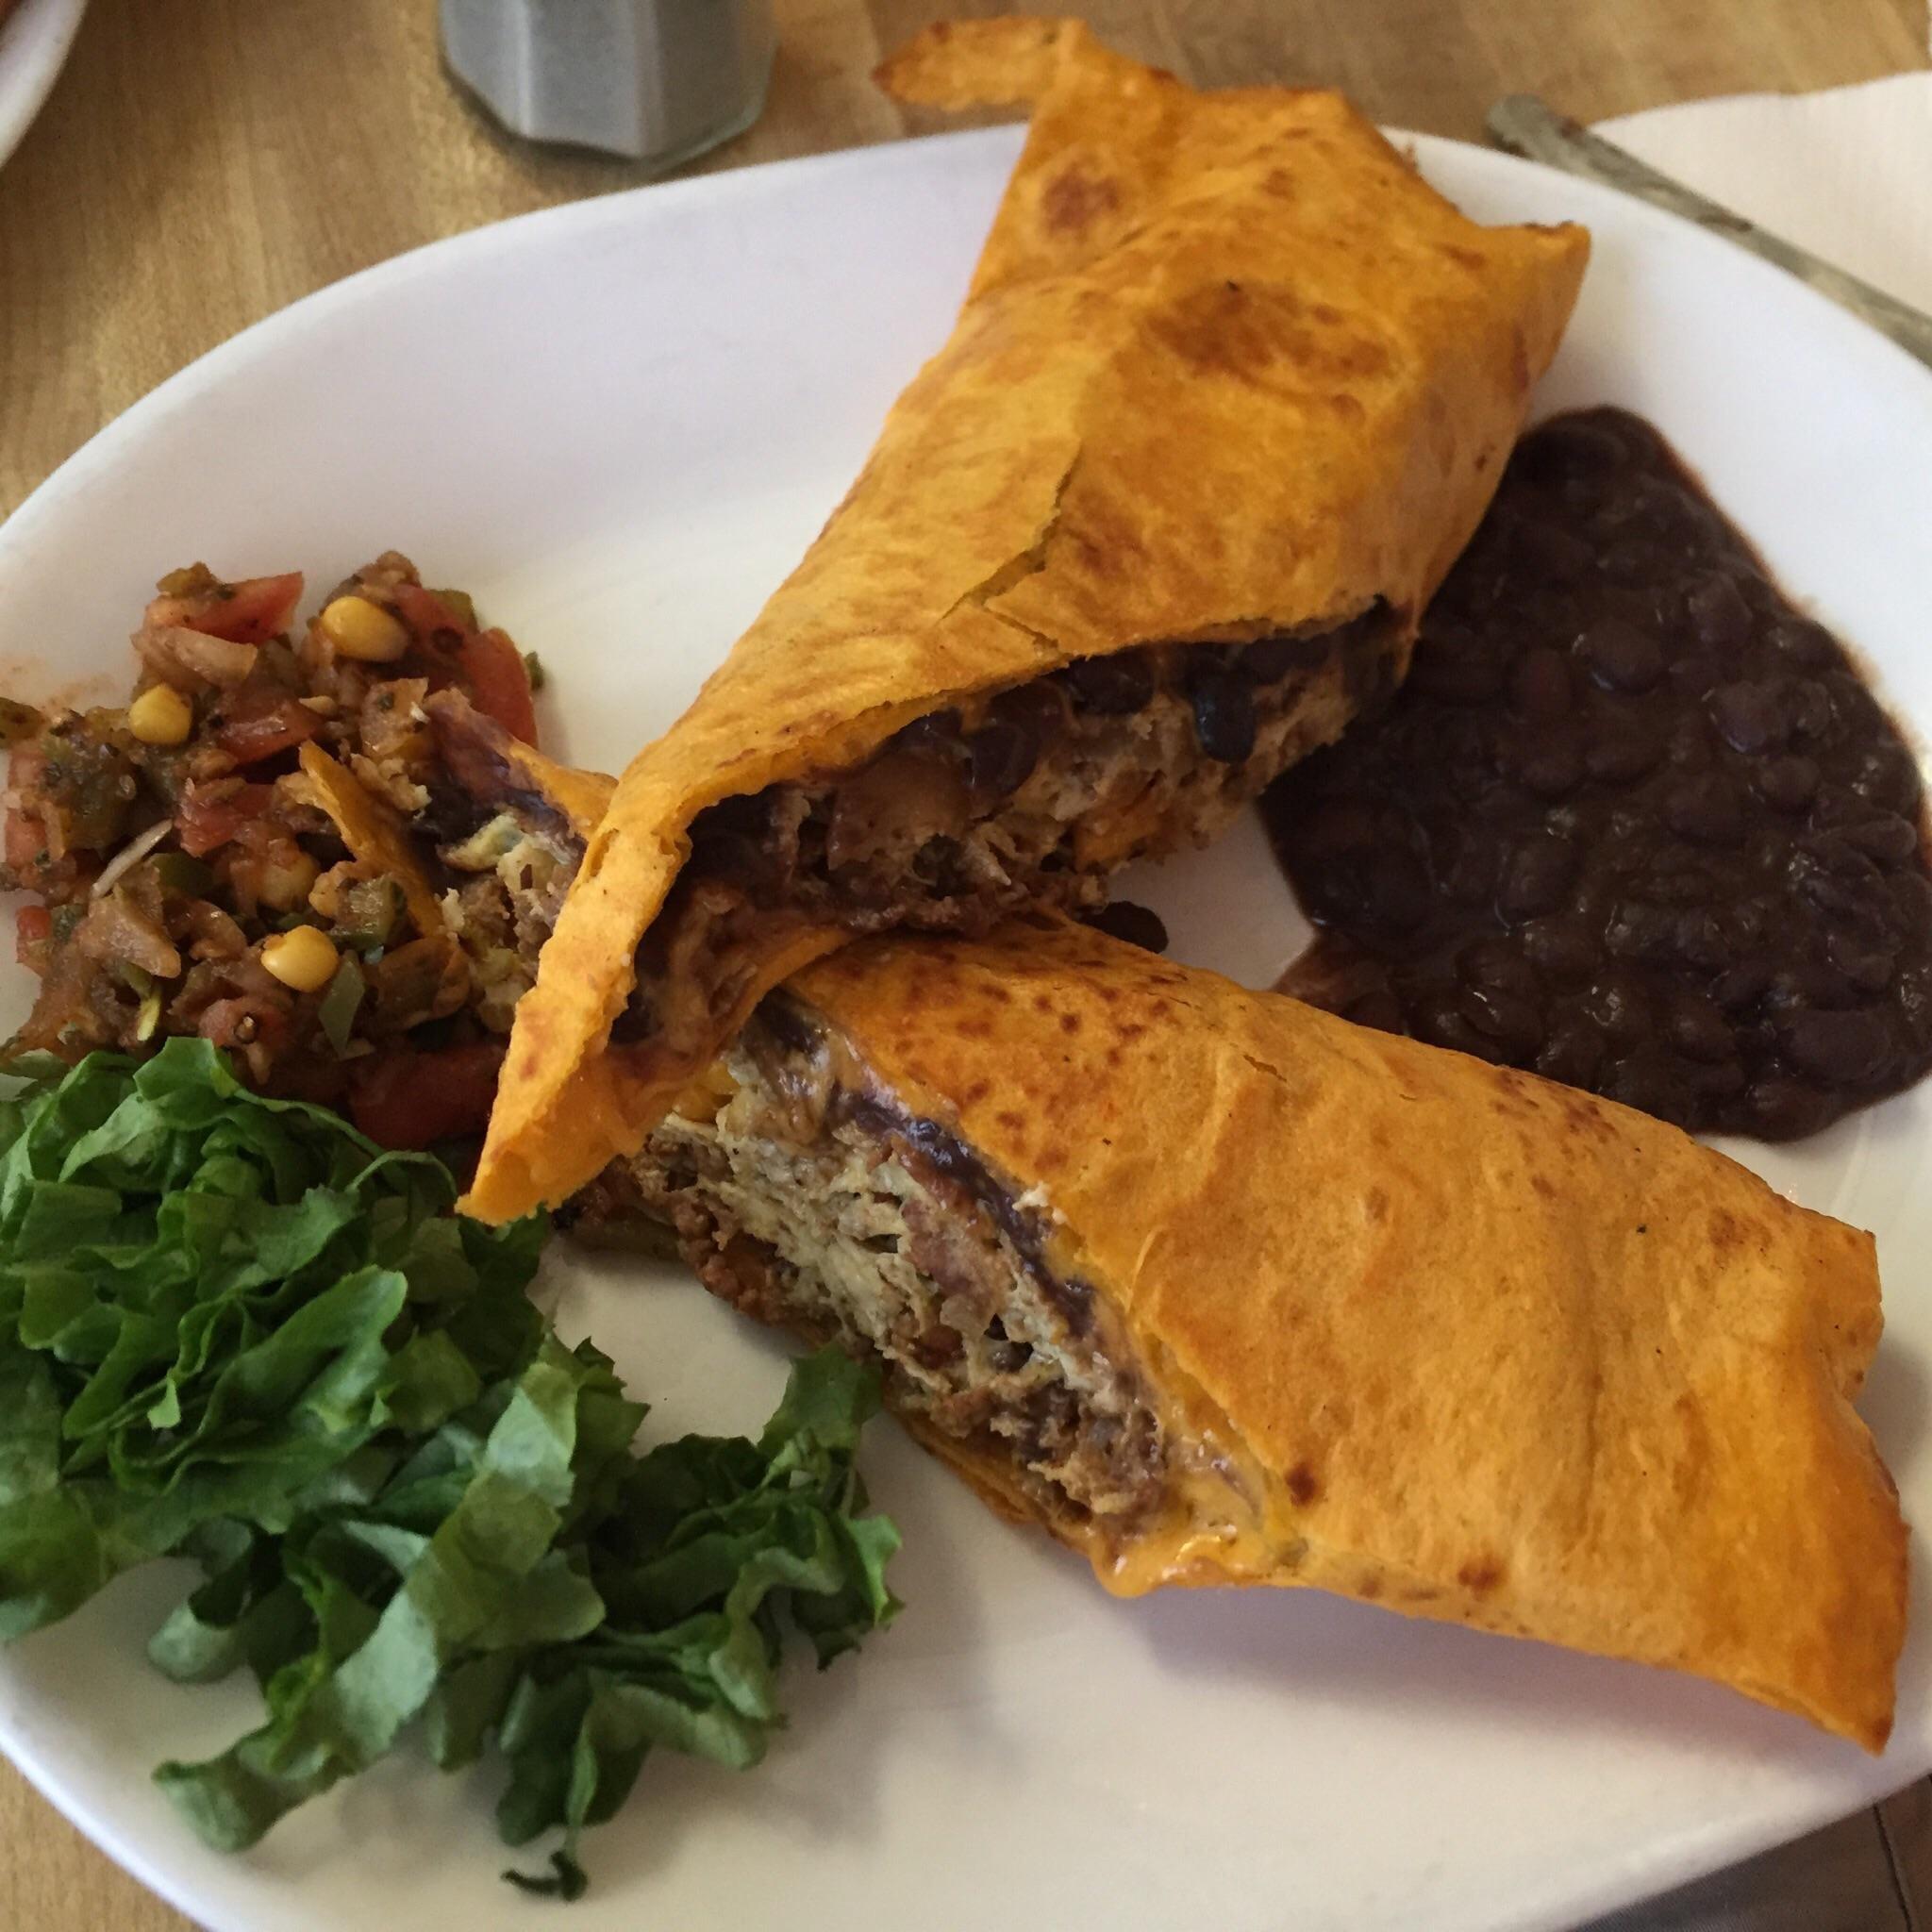 The Blackhawk Burrito